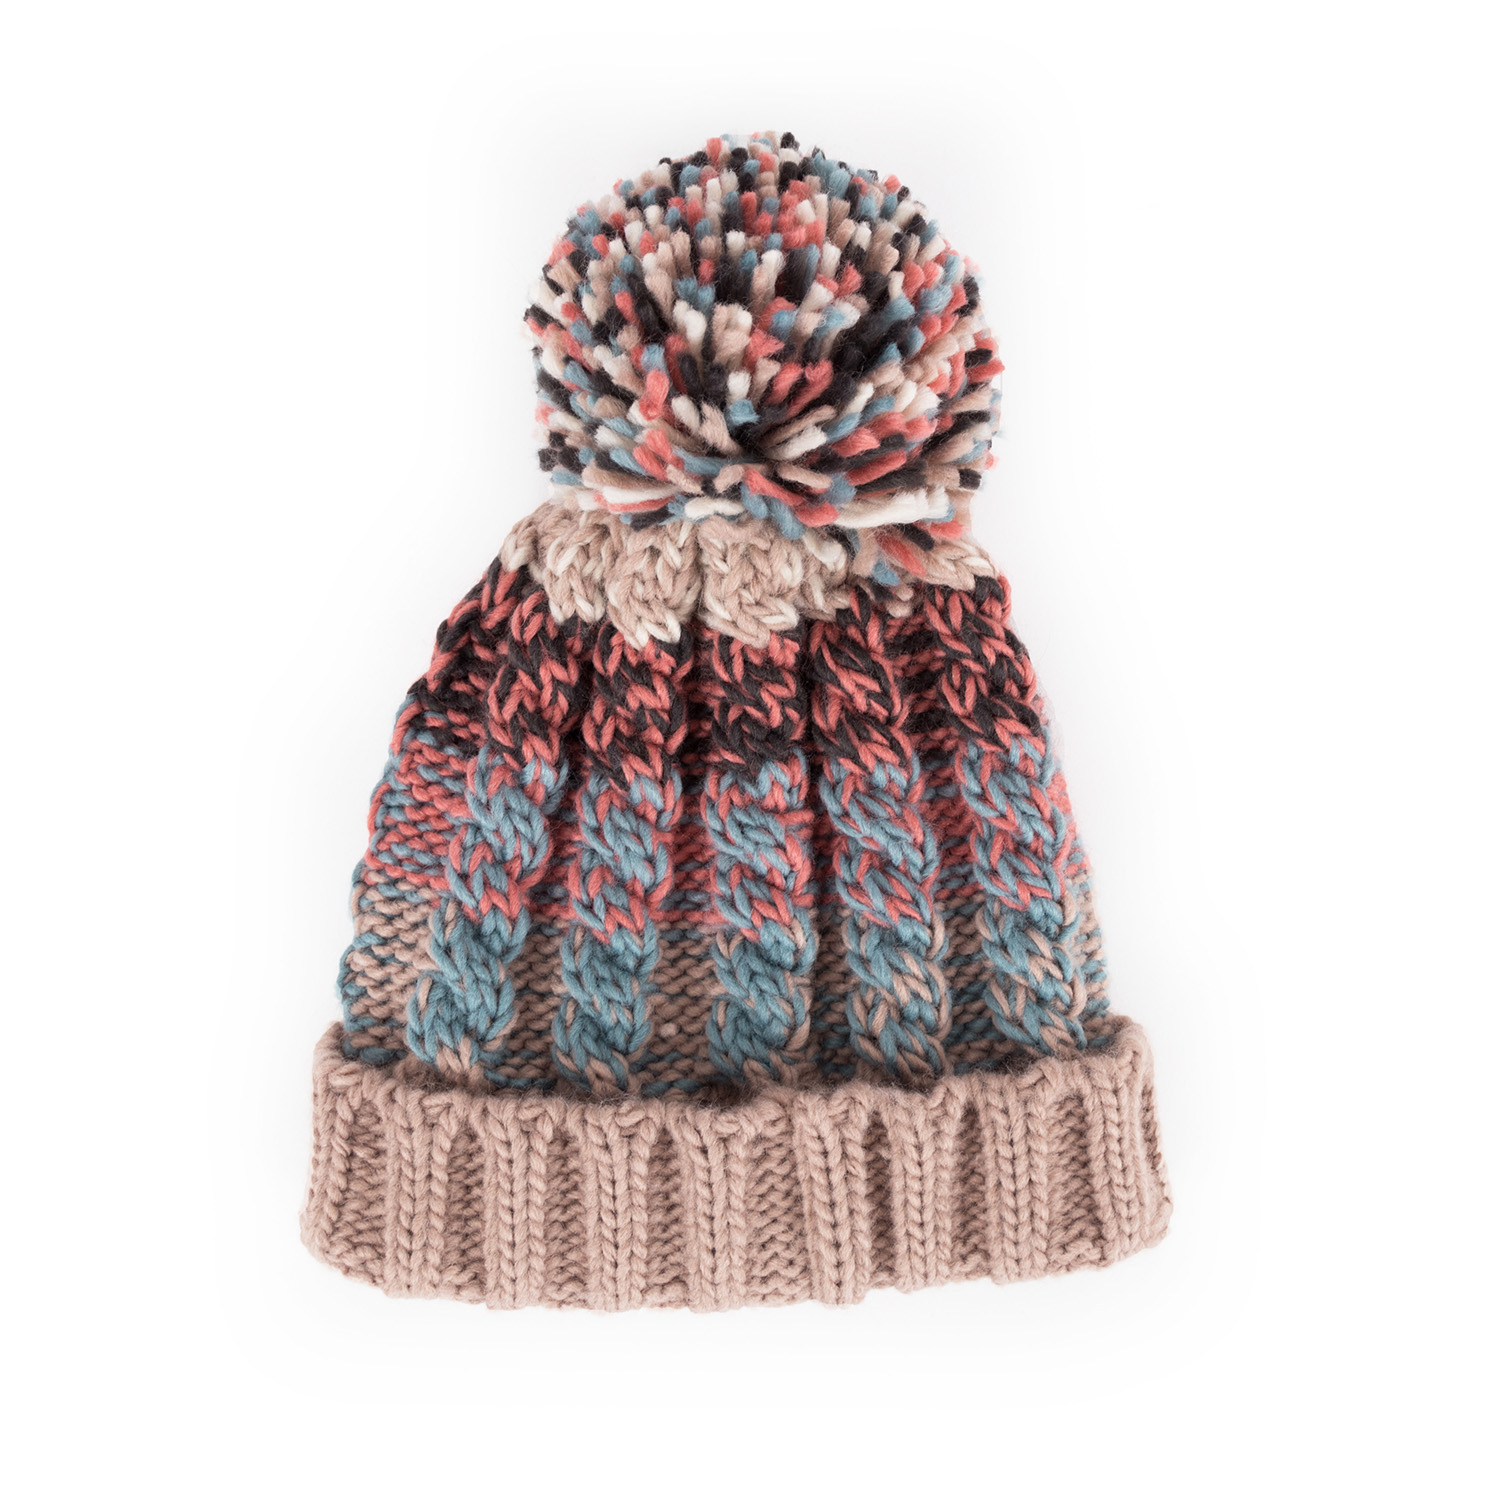 Powder – Astrid Teal Mix Knitted Pom Pom Hat with Powder Presentation Gift Bag